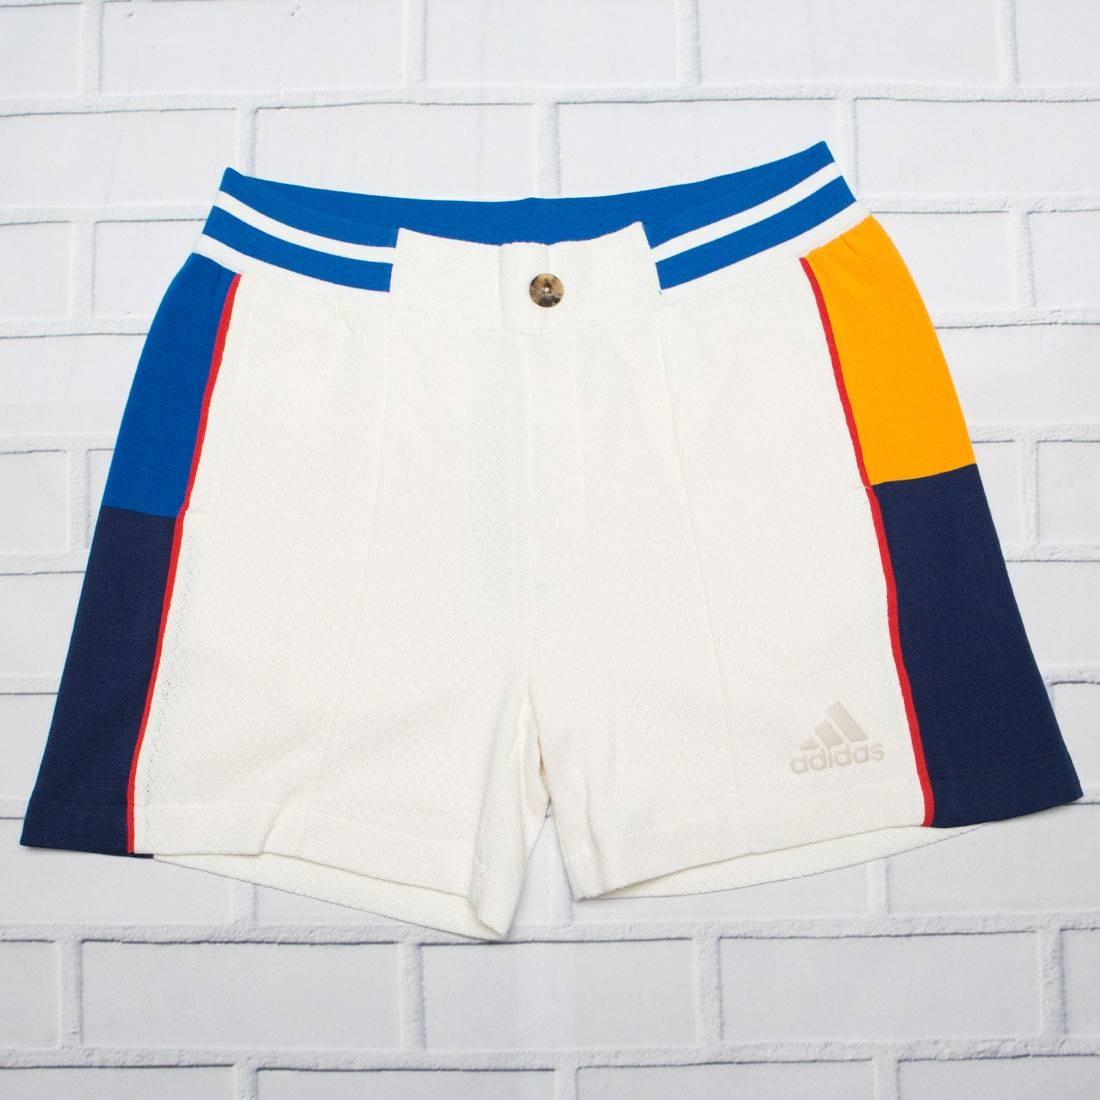 Adidas x Pharrell Williams Men NY Colorblock Shorts LTD (white / chalk white / blue)